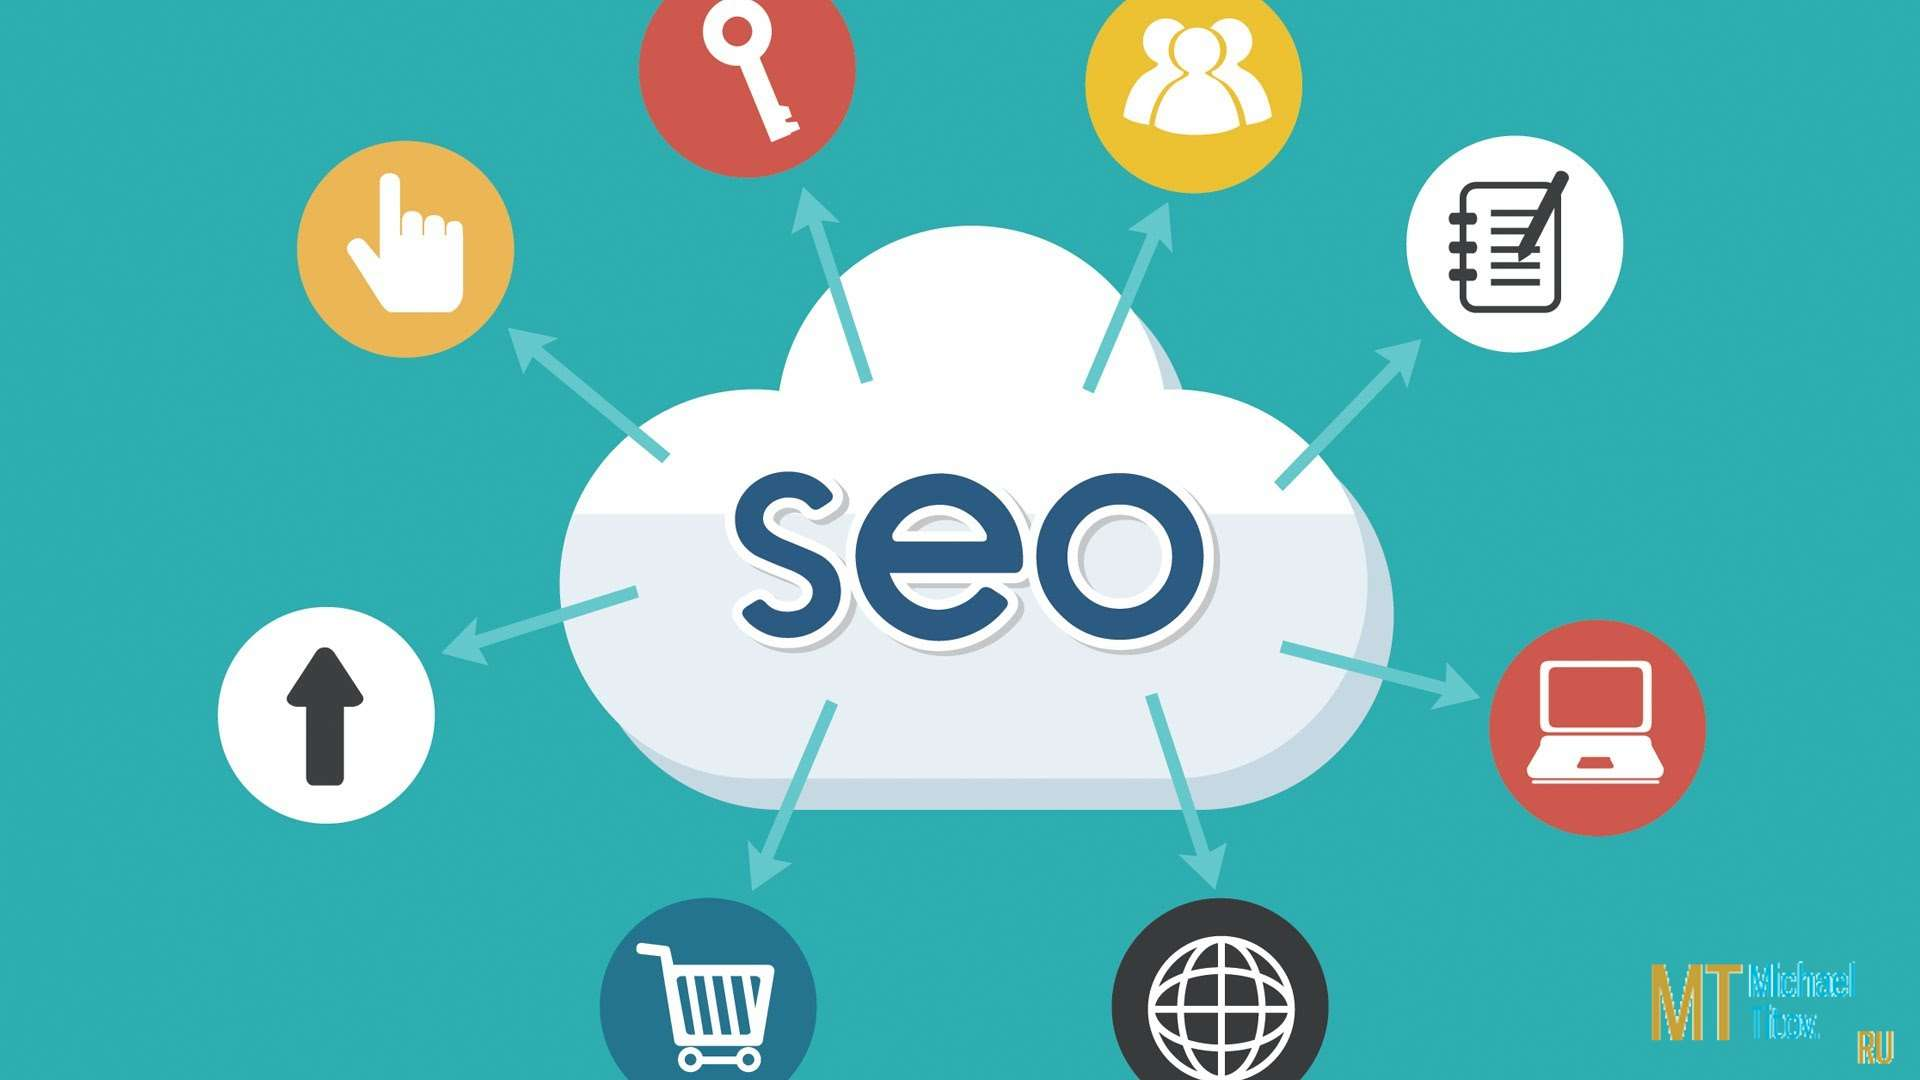 Что должен знать интернет-маркетолог?